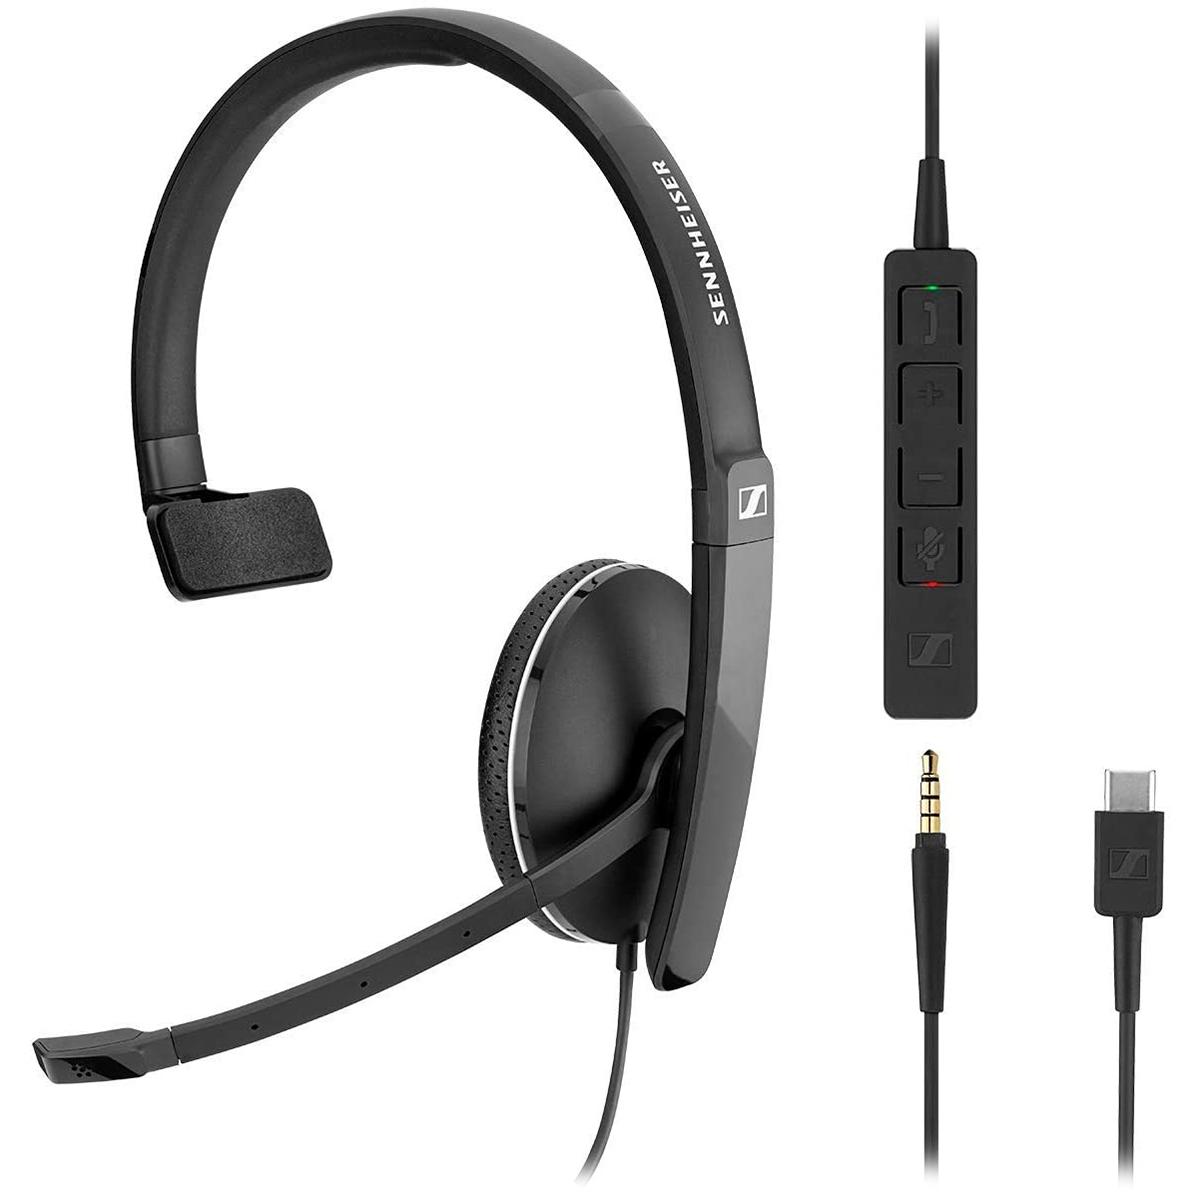 EPOS Sennheiser SC135 USB-C Mono Headset